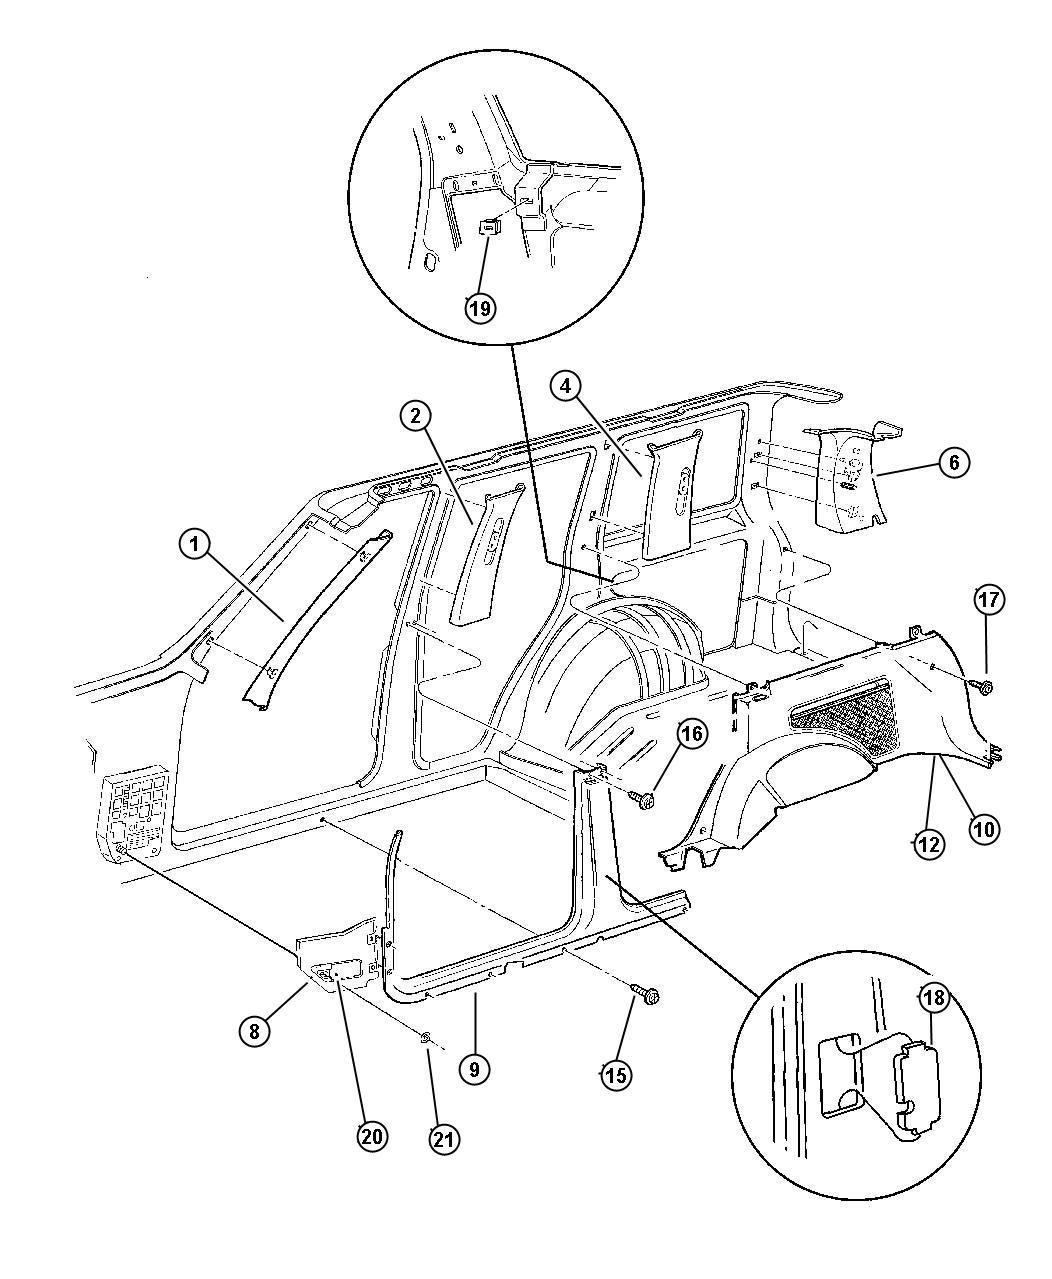 Jeep Grand Cherokee Molding C Pillar Right T6 Saddle Trim All Trim Codes Color